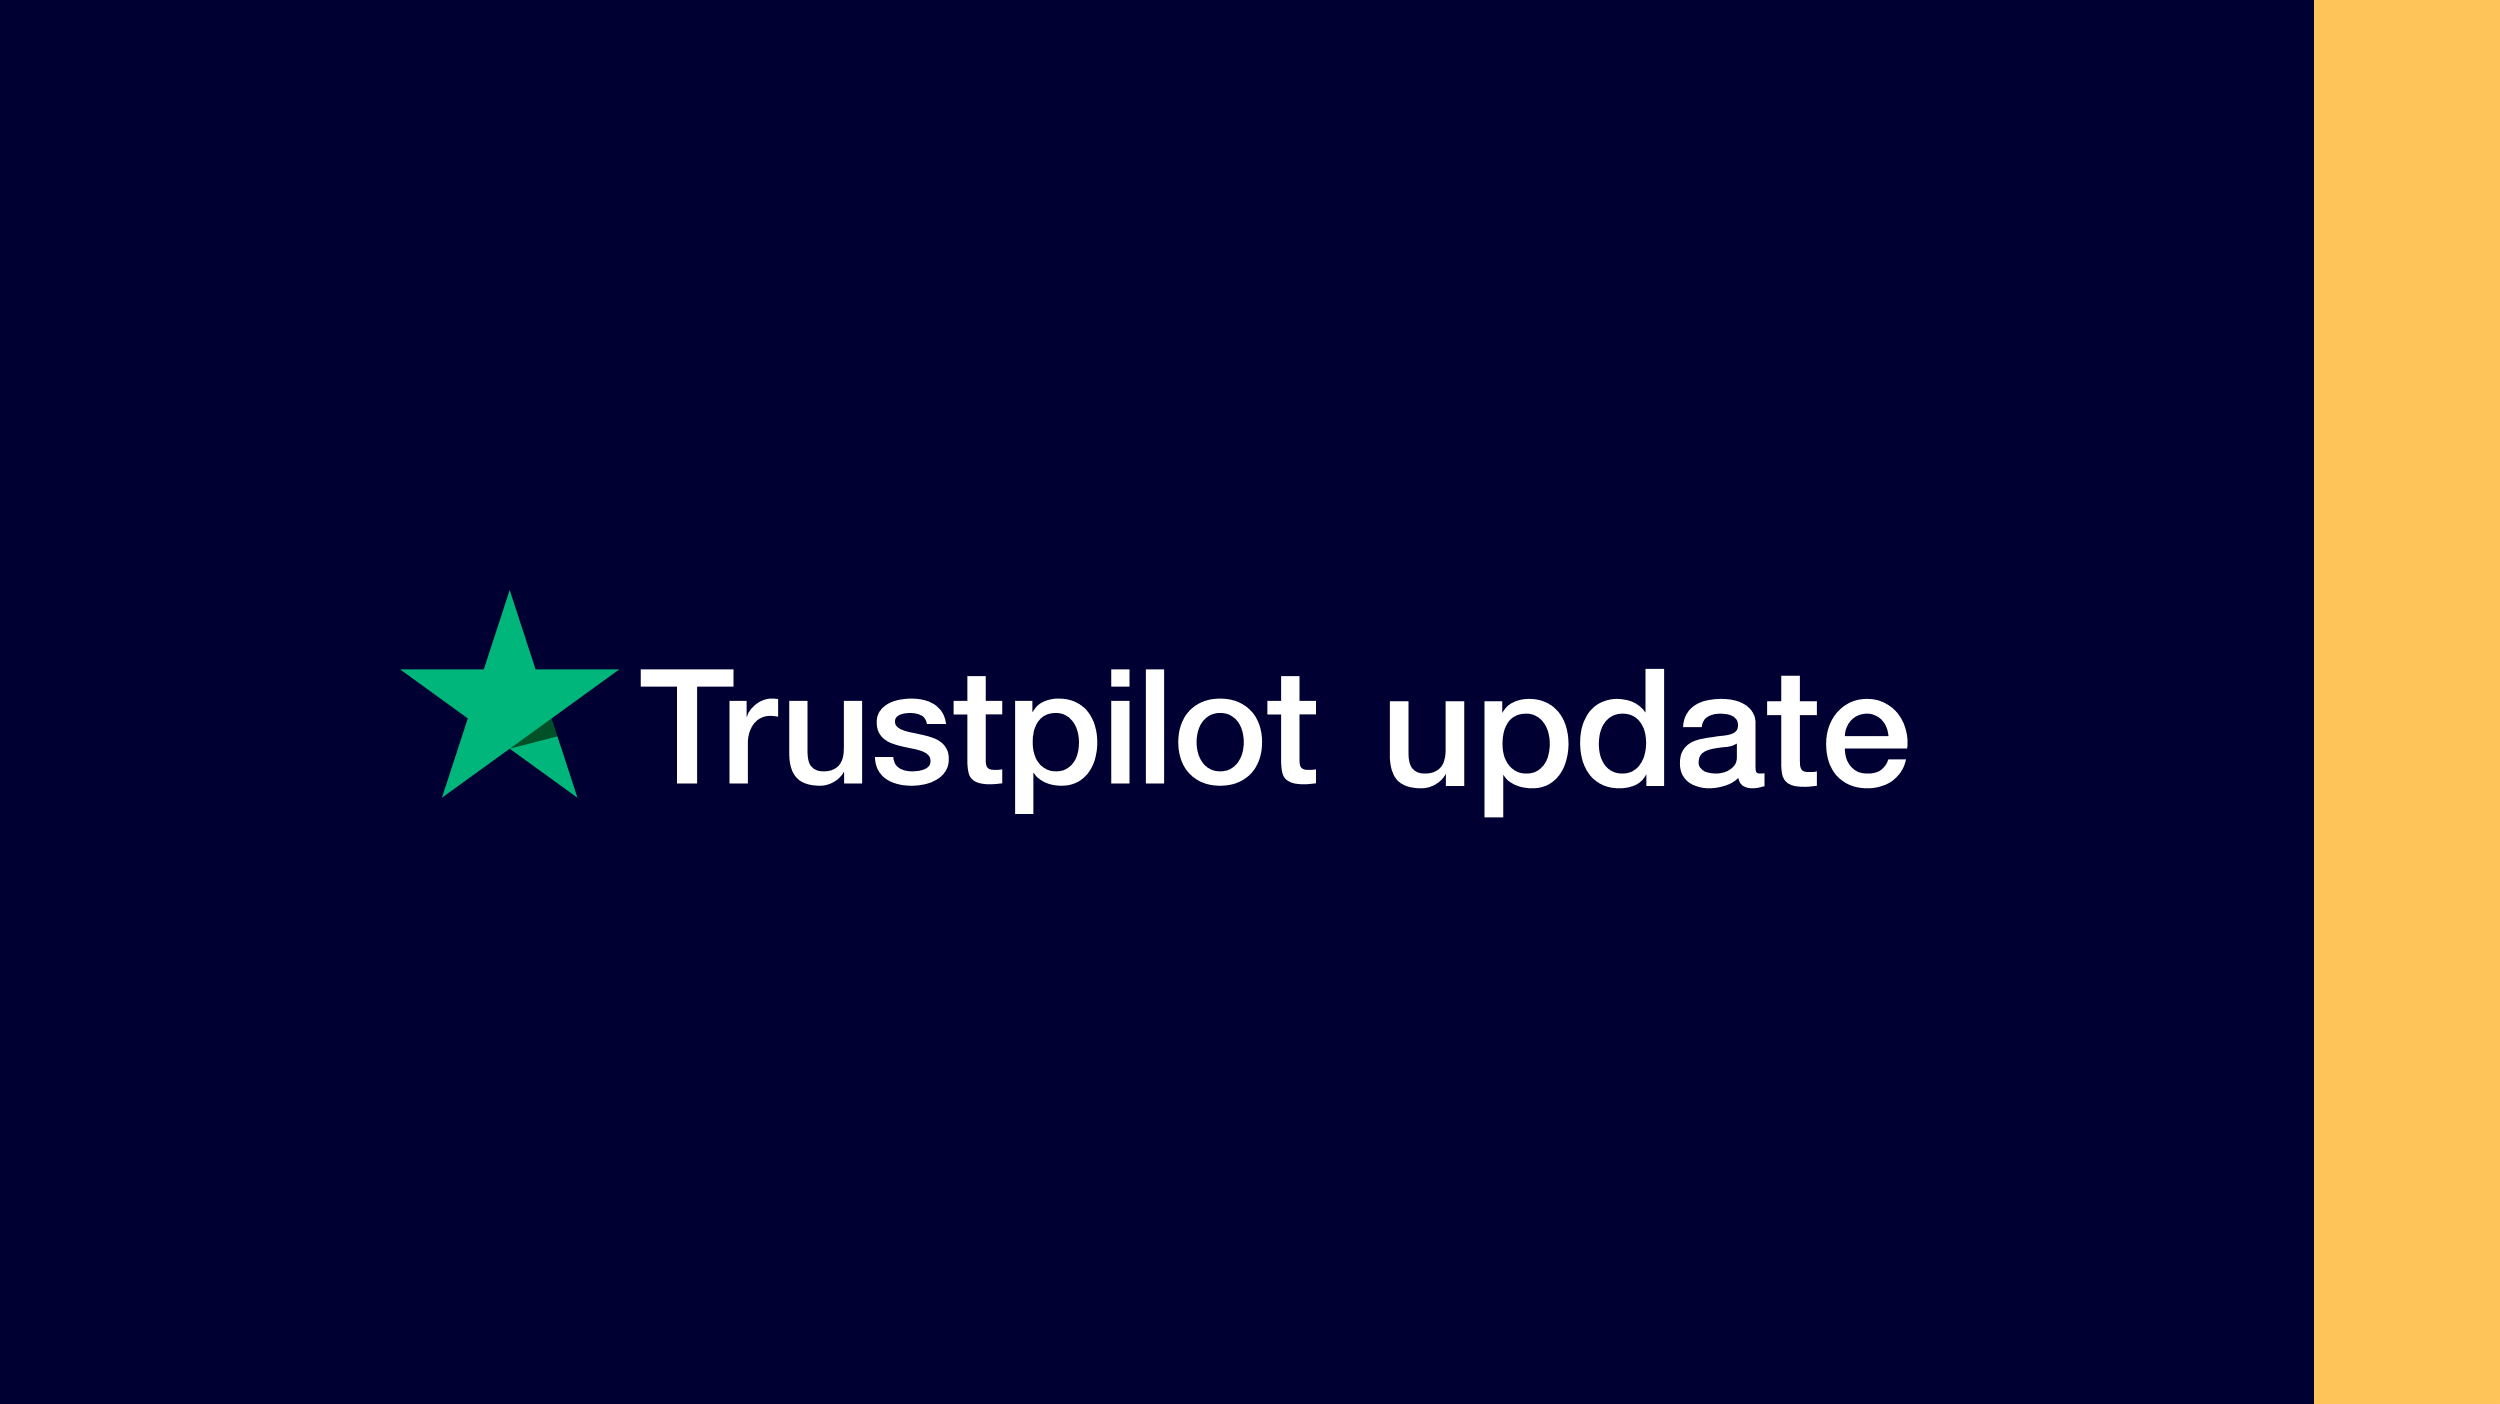 Trustpilot: Our trust promise, June 2020